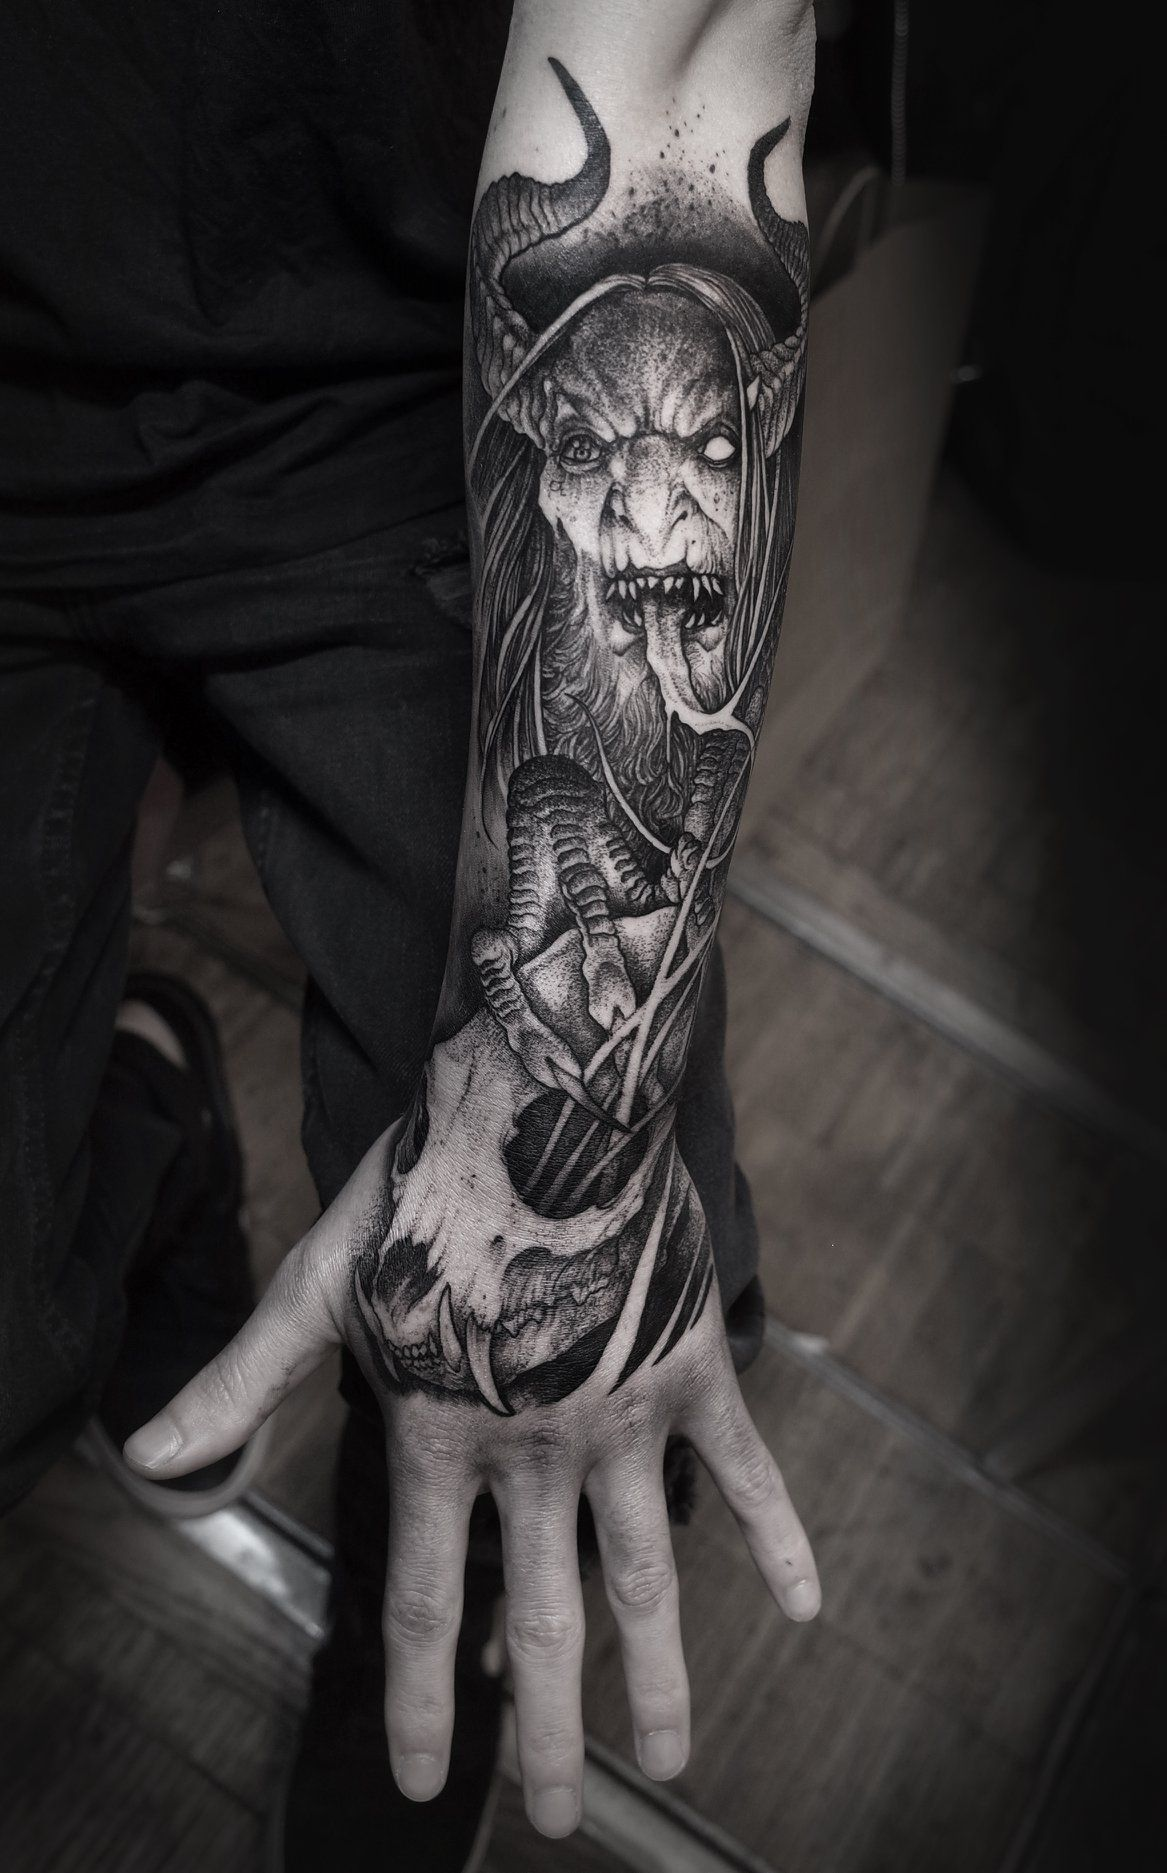 Satanic Tattoo: Satanic Tattoos, Scary Tattoos